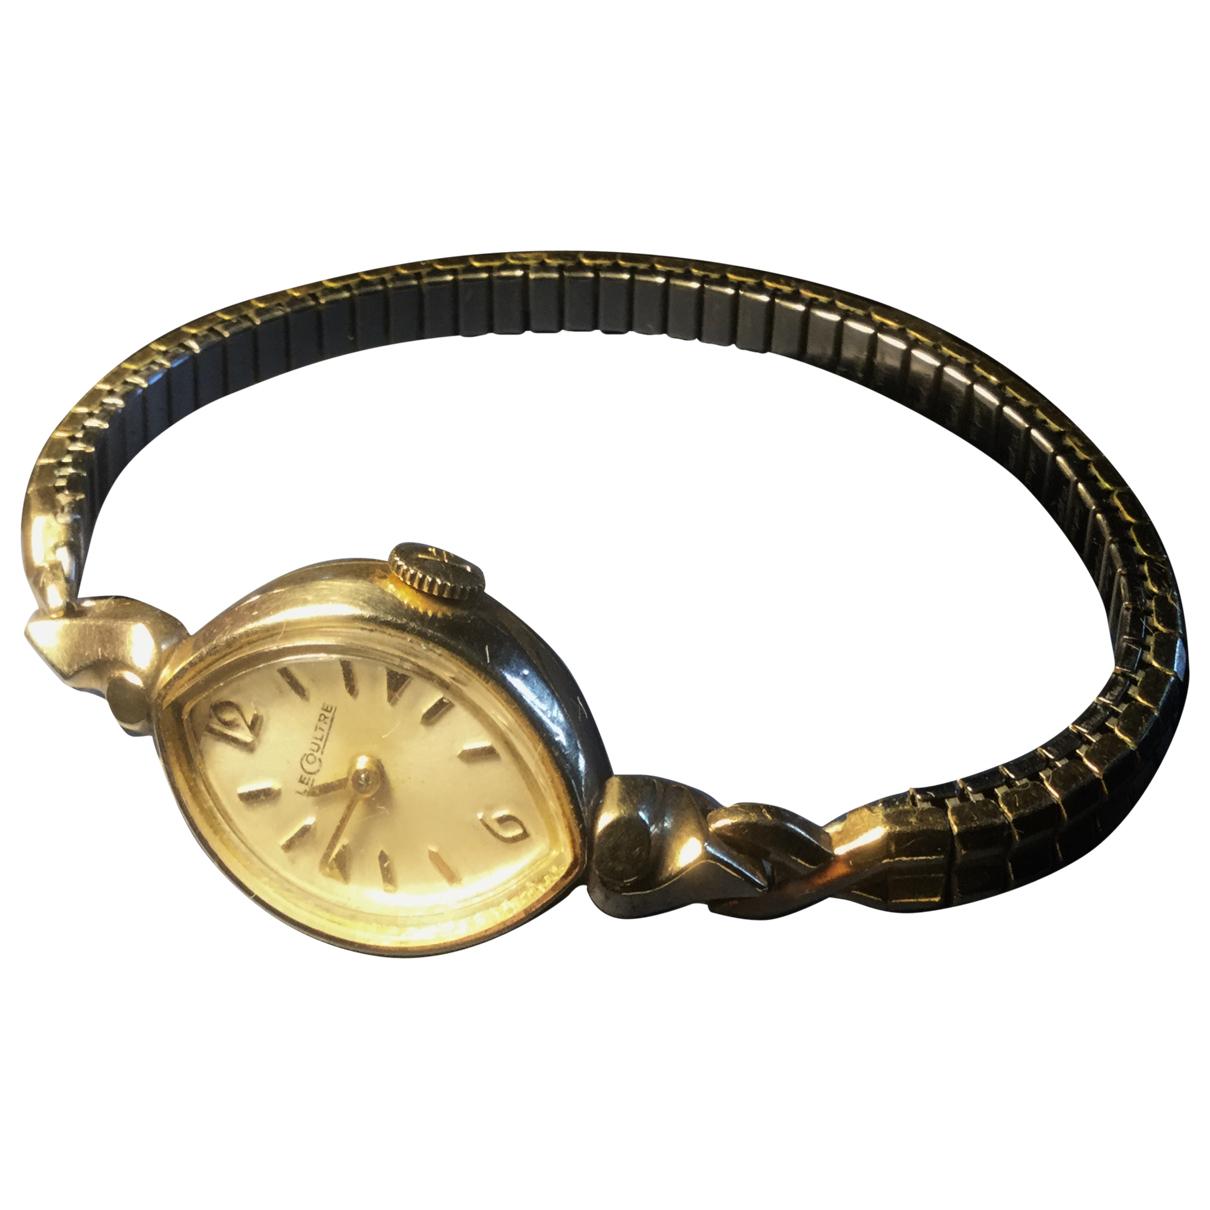 Jaeger-lecoultre Vintage Uhr in  Gold Gelbgold